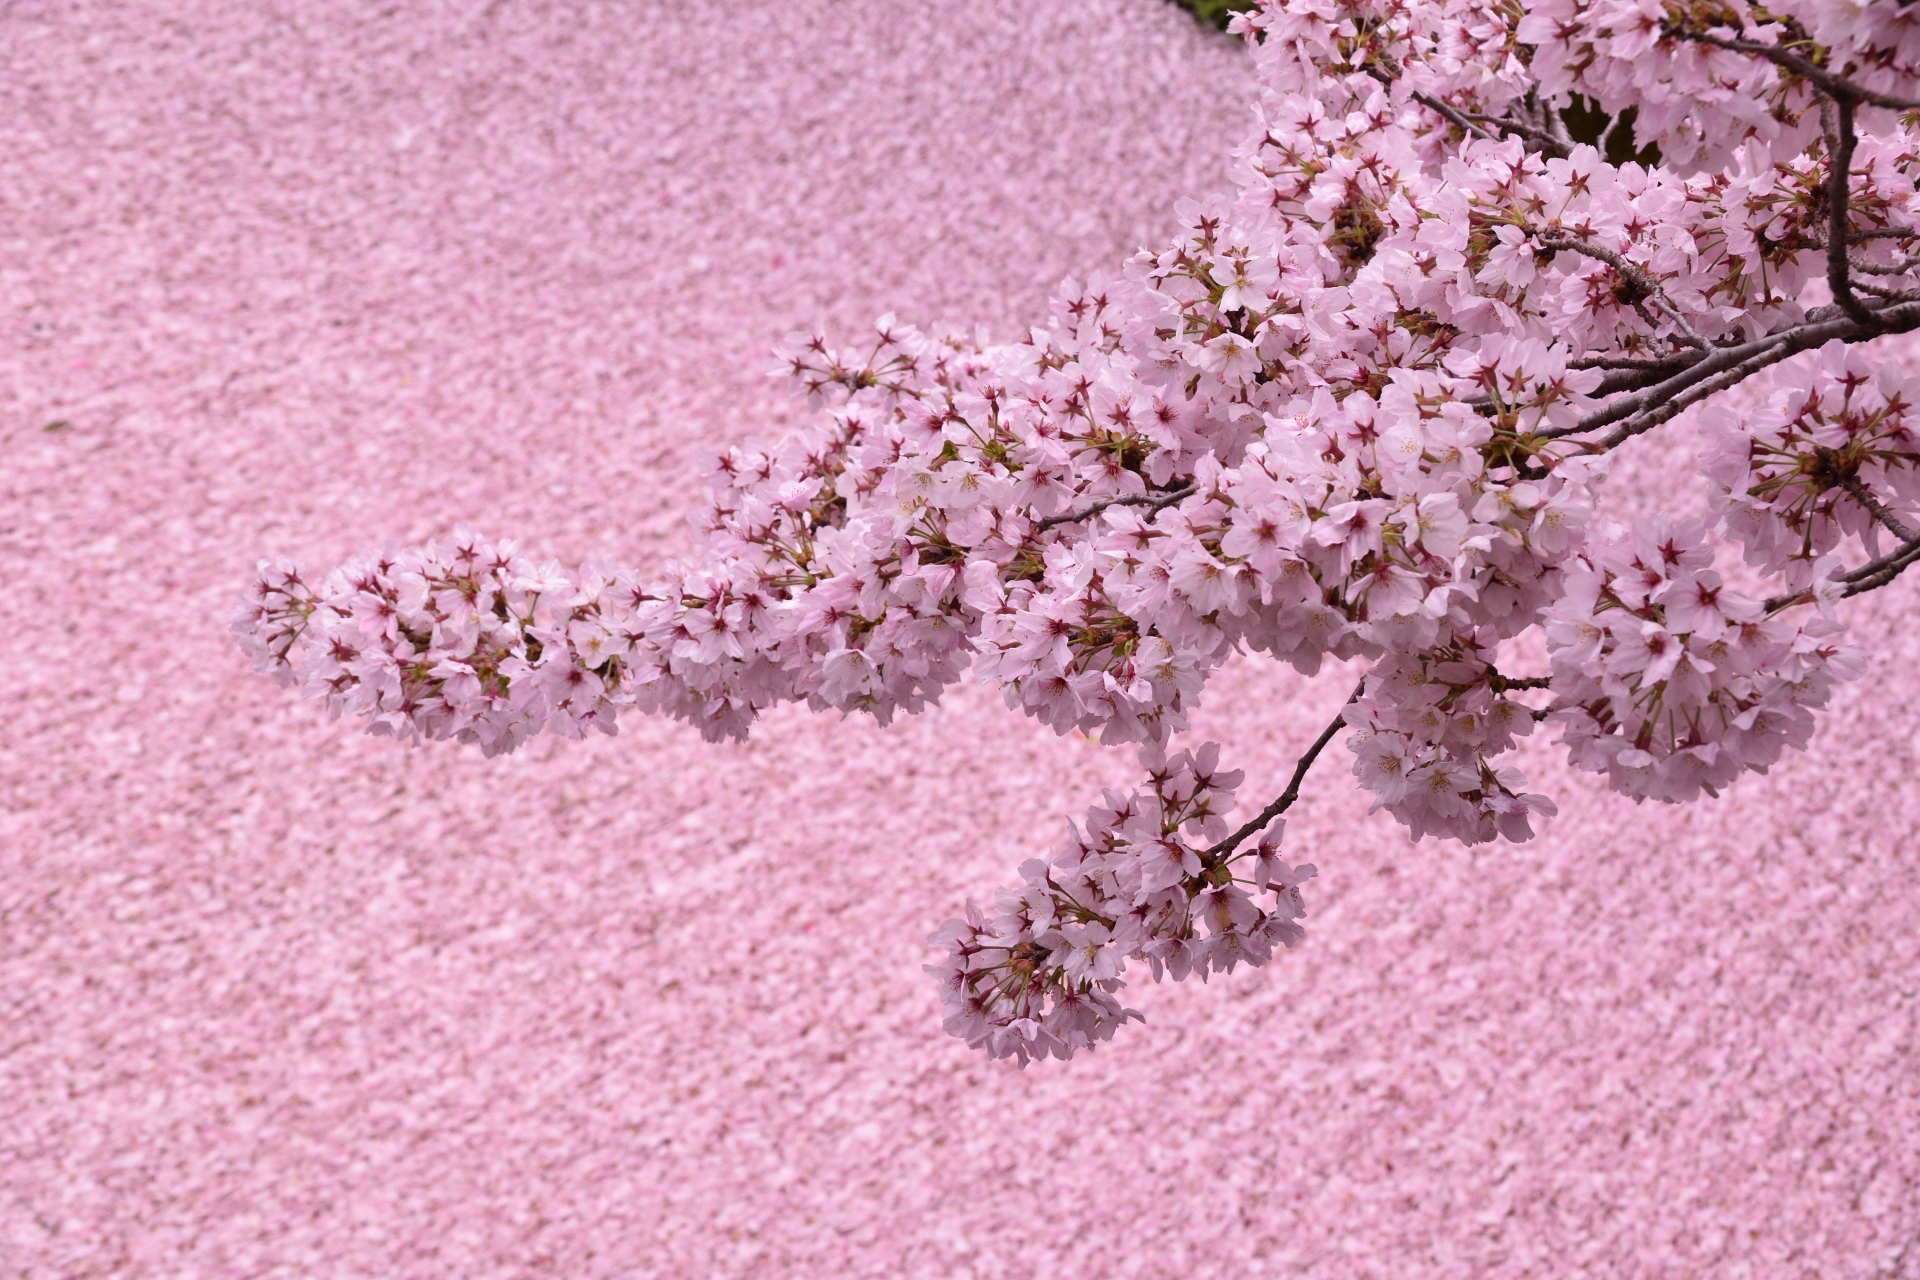 969738_m 京都府 哲学の道(疎水沿いに咲く桜の並木道が美しい春におすすめ写真スポット! 写真の紹介、アクセス情報など)